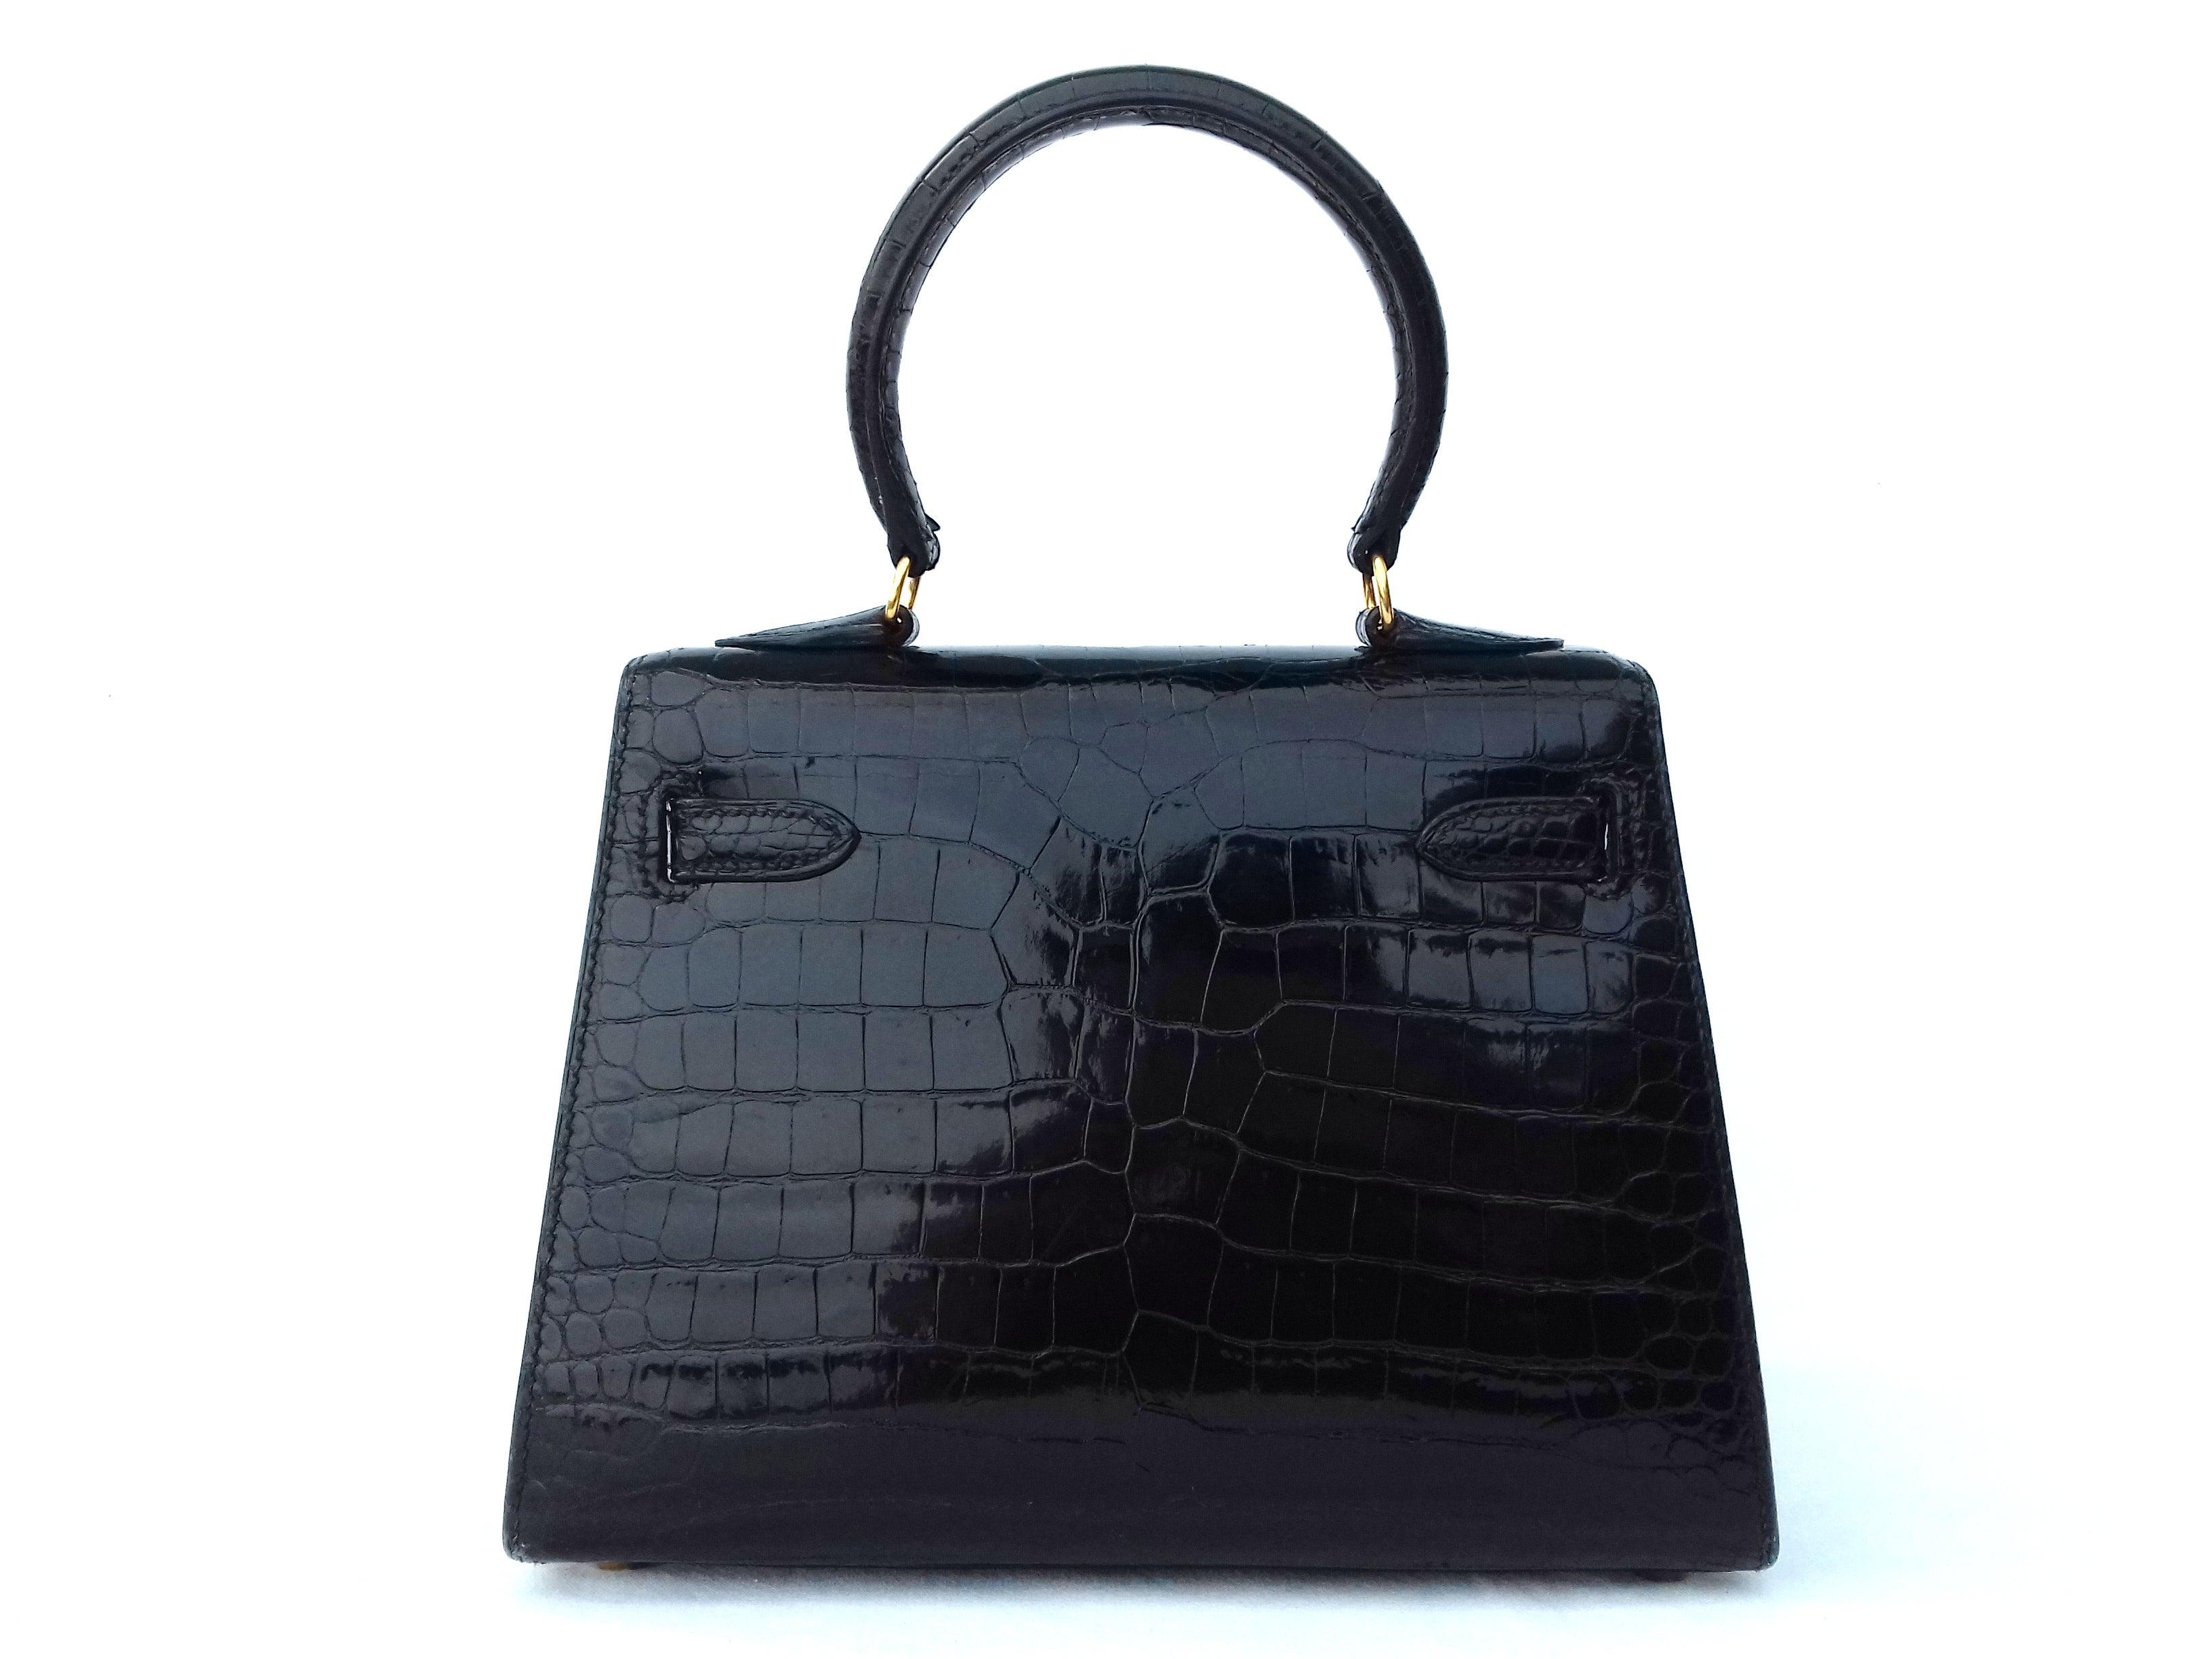 1f72e89f5732 Hermès Mini Kelly Vintage Bag Sellier Black Croco Crocodile Ghw 20 cm RARE  at 1stdibs